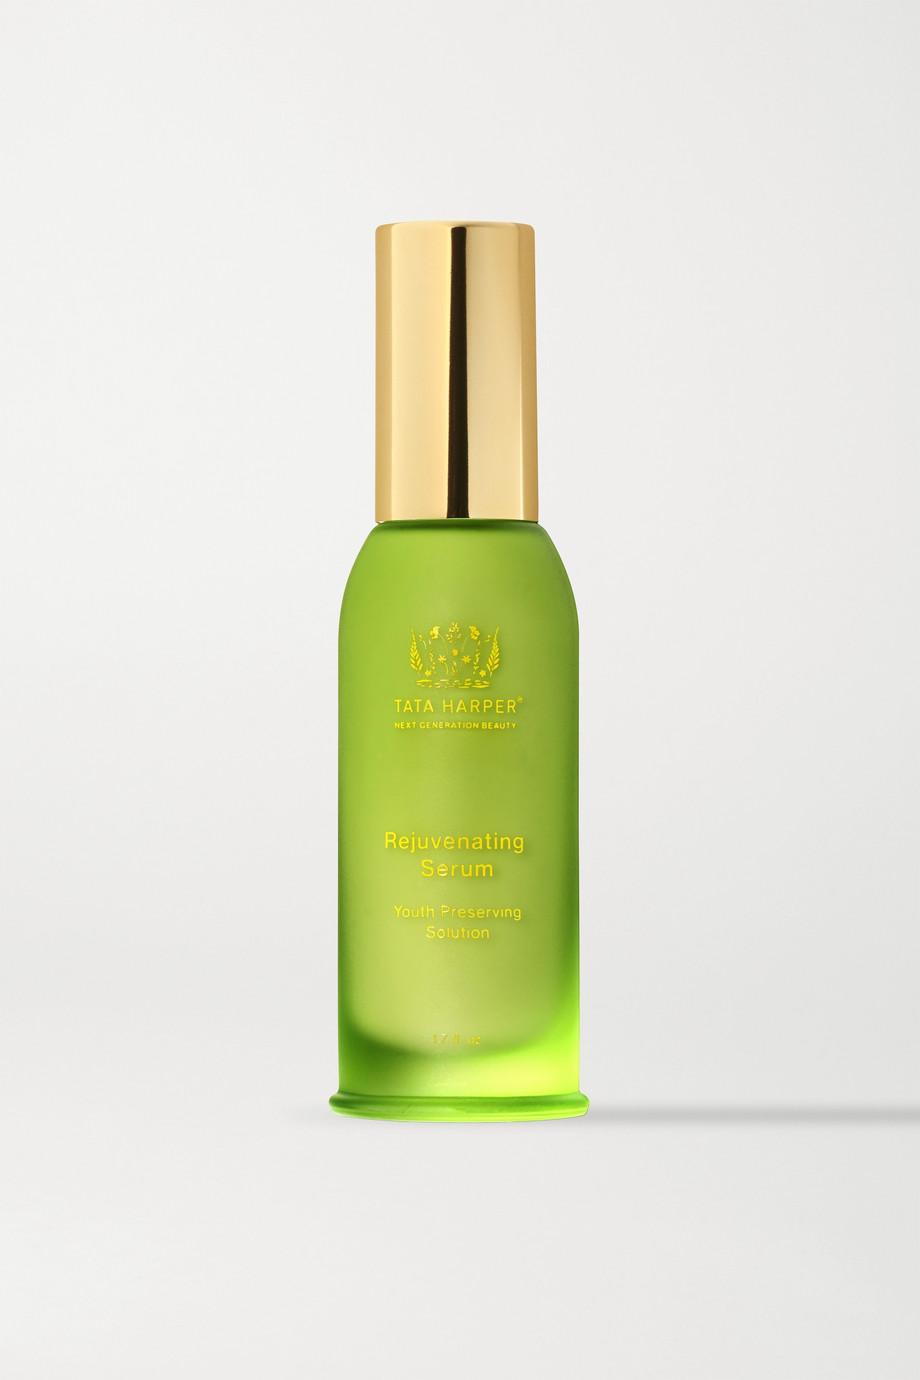 Rejuvenating Serum, 50ml, by Tata Harper